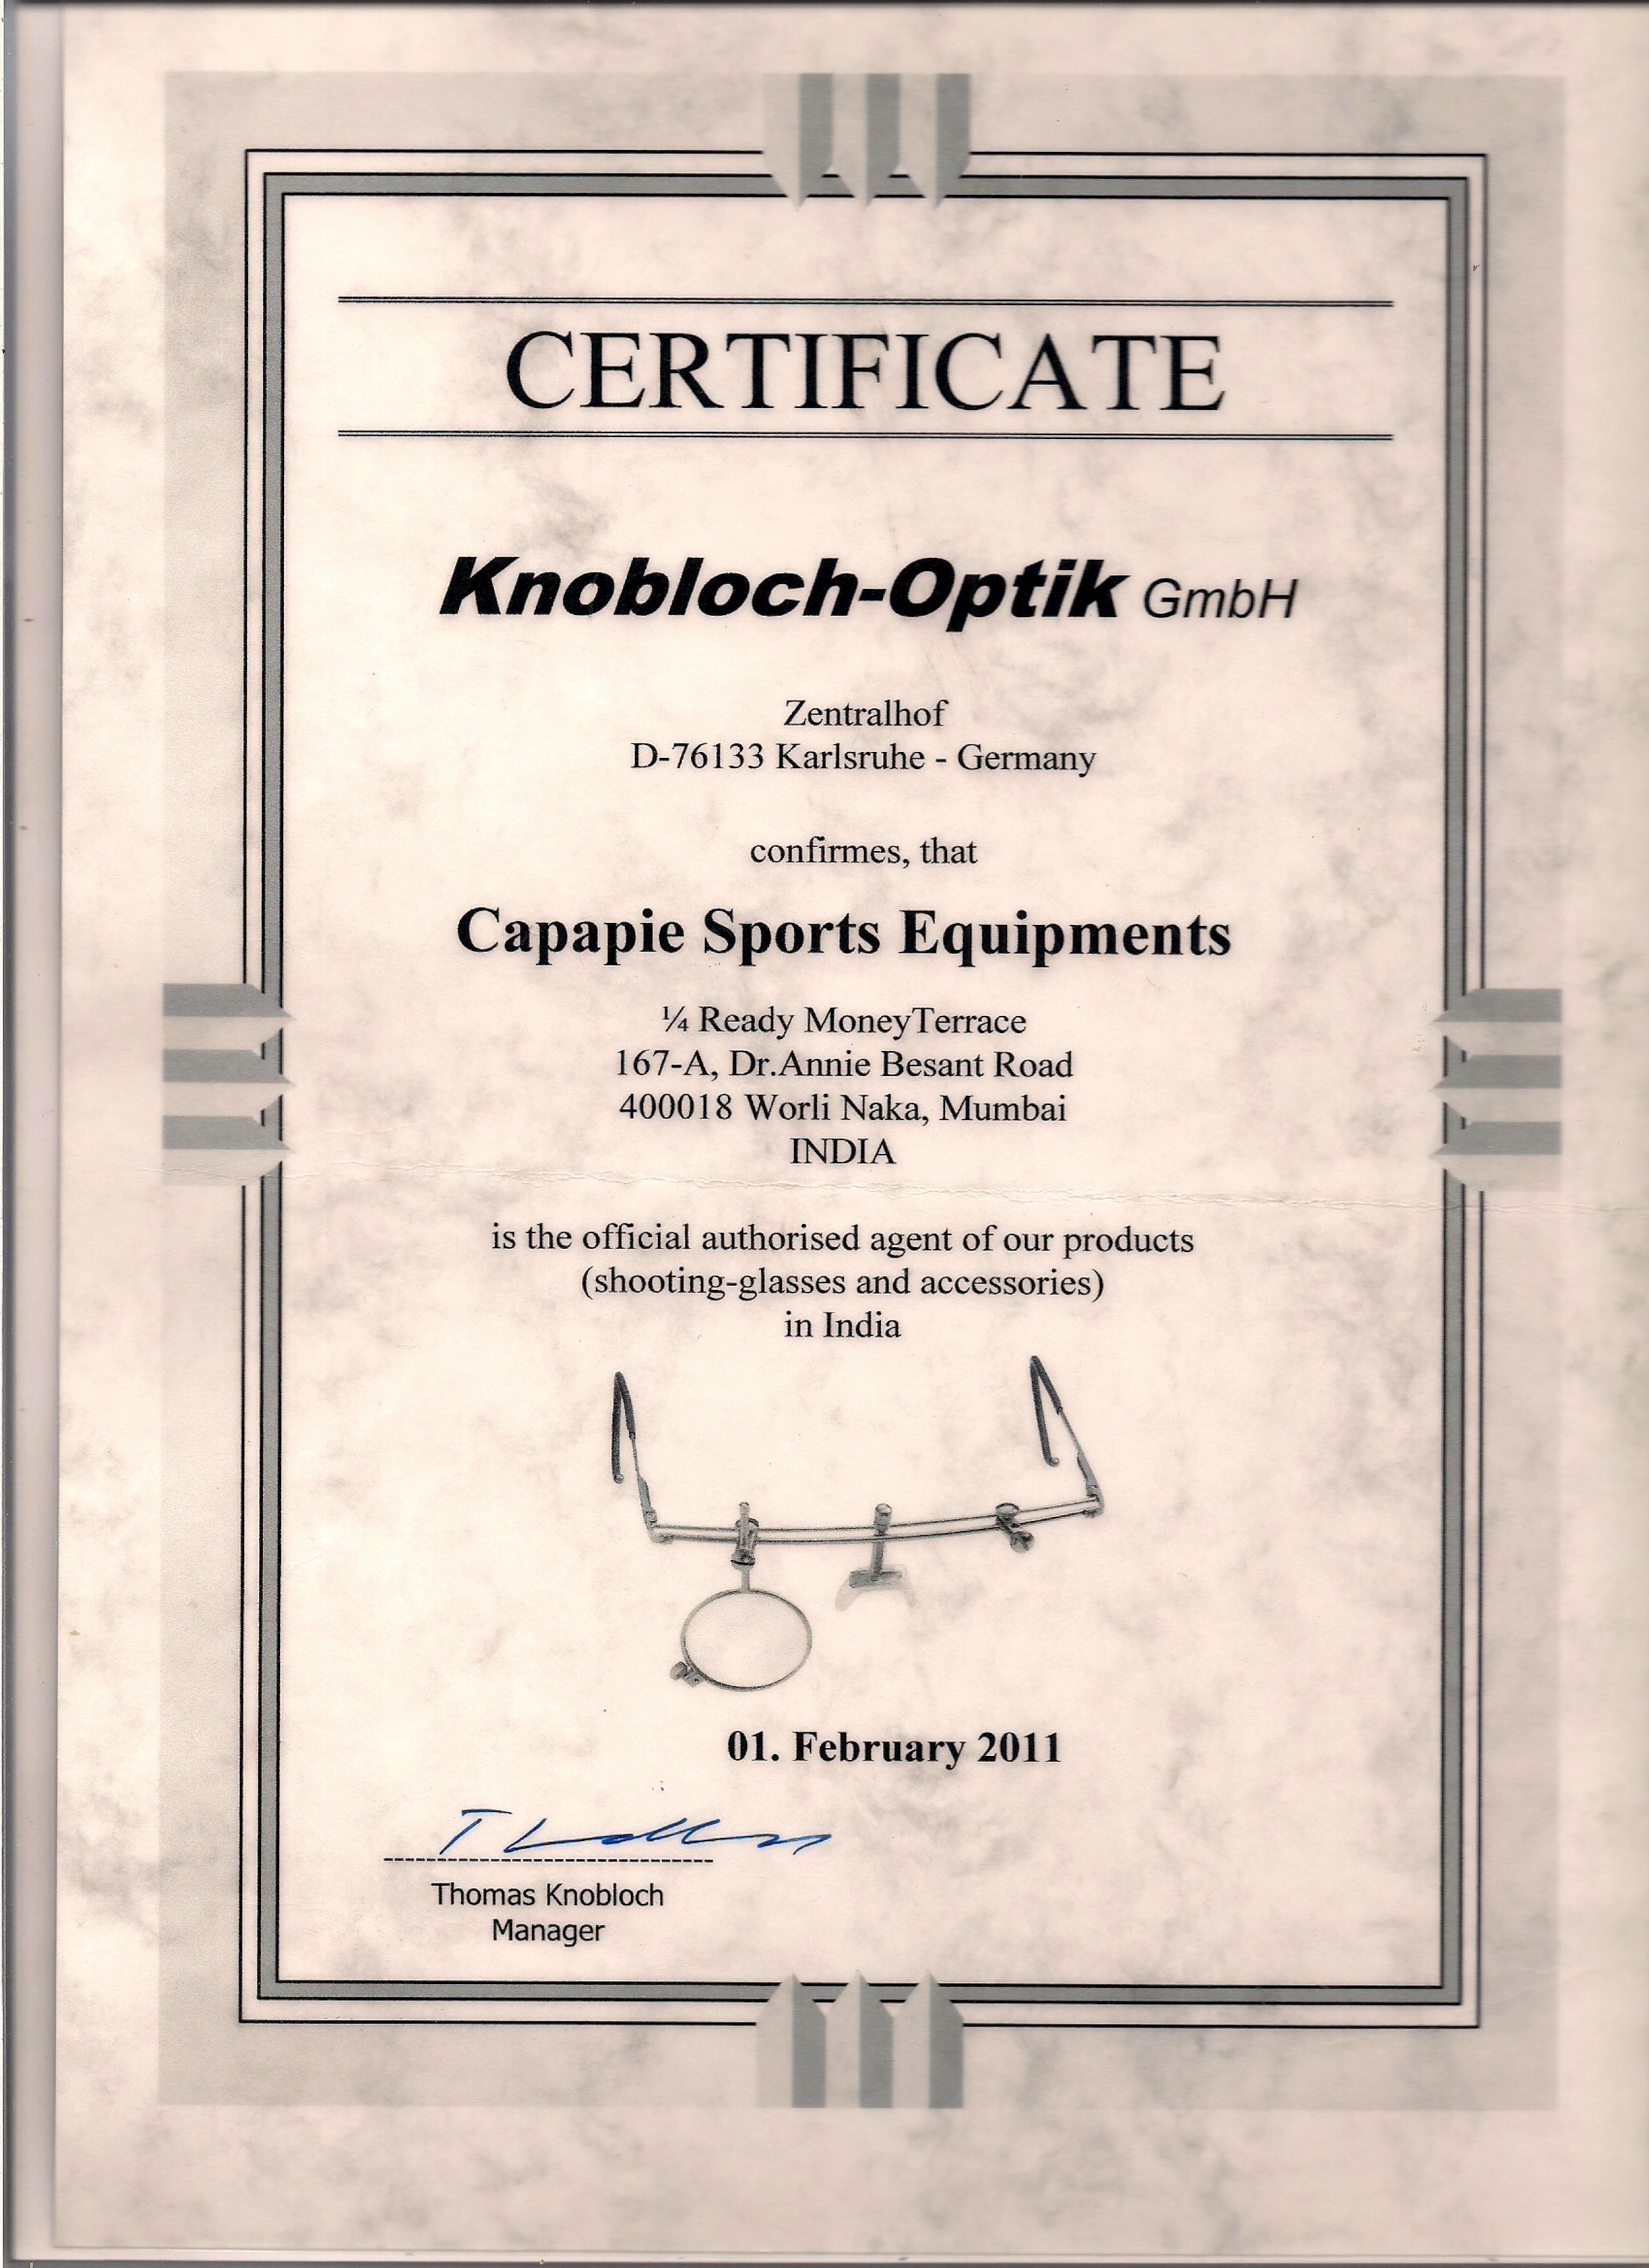 capapie sports